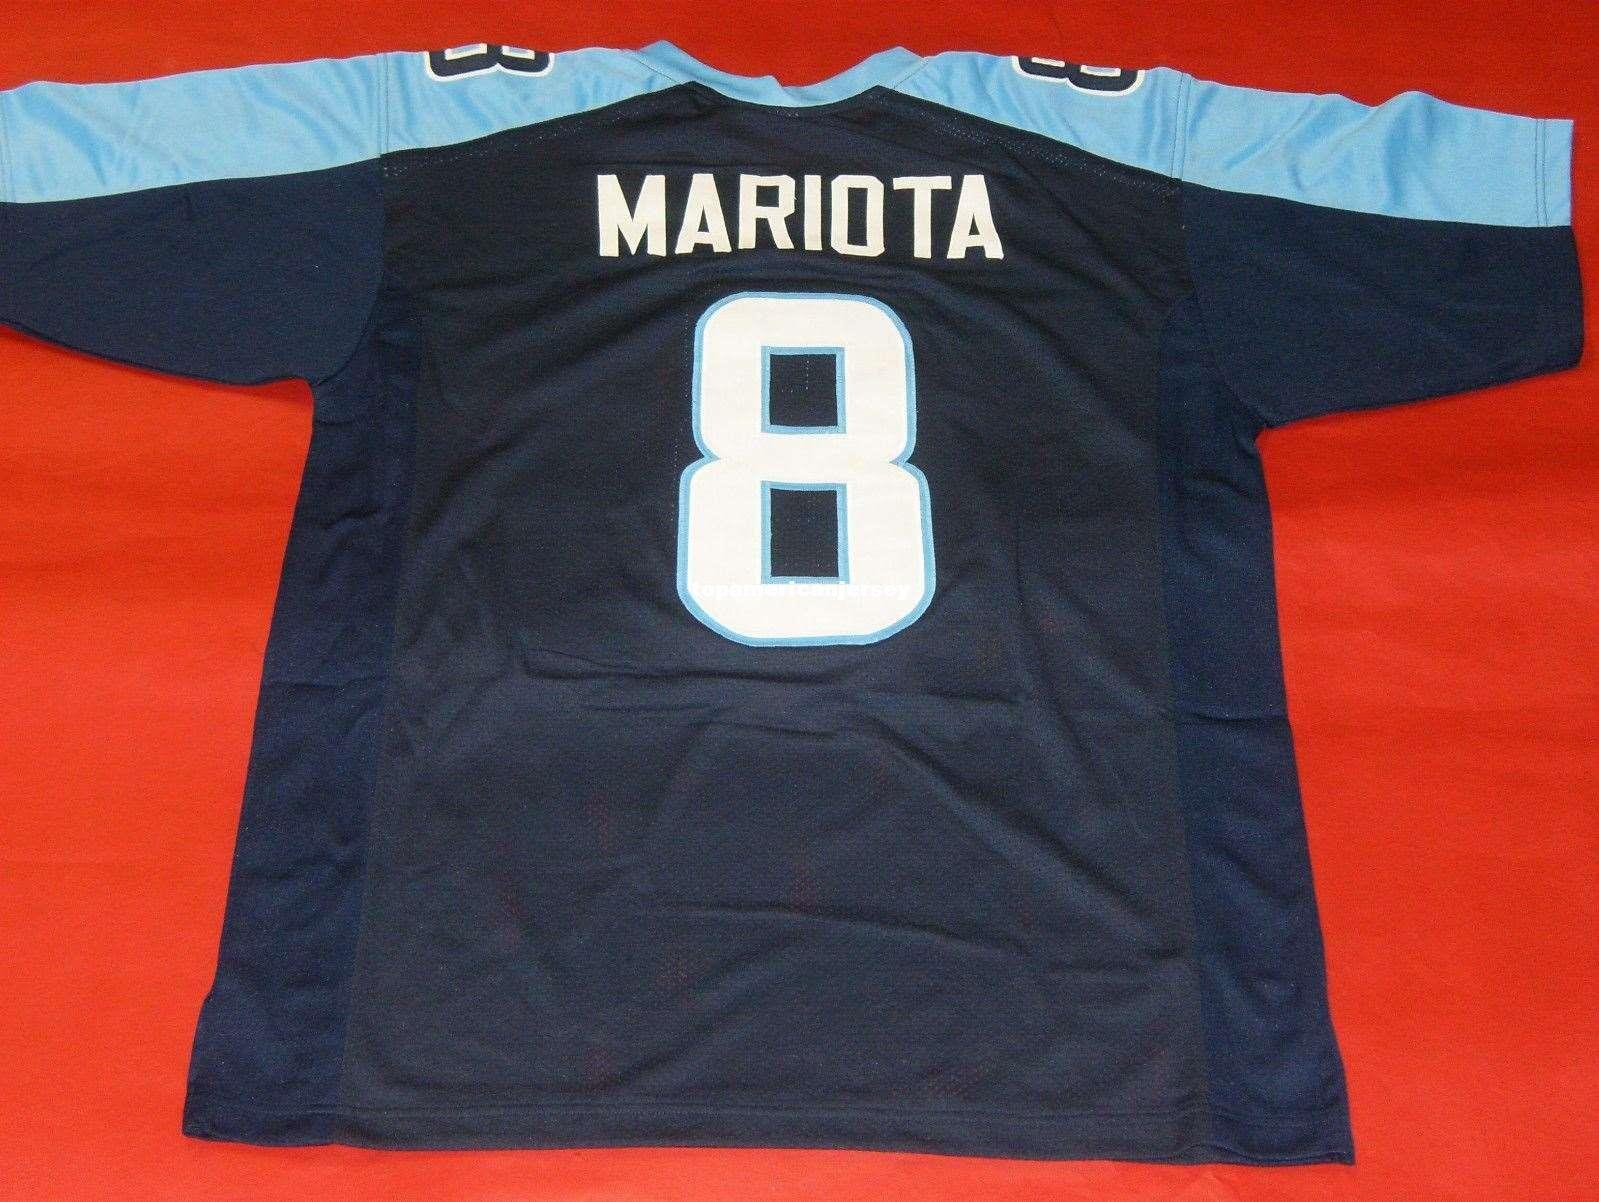 Barato retro # 8 MARCUS MARIOTA CUSTOM MITCHELL NESS Jersey bule para hombre Top de costura S-5XL, 6XL camisetas de fútbol Correr